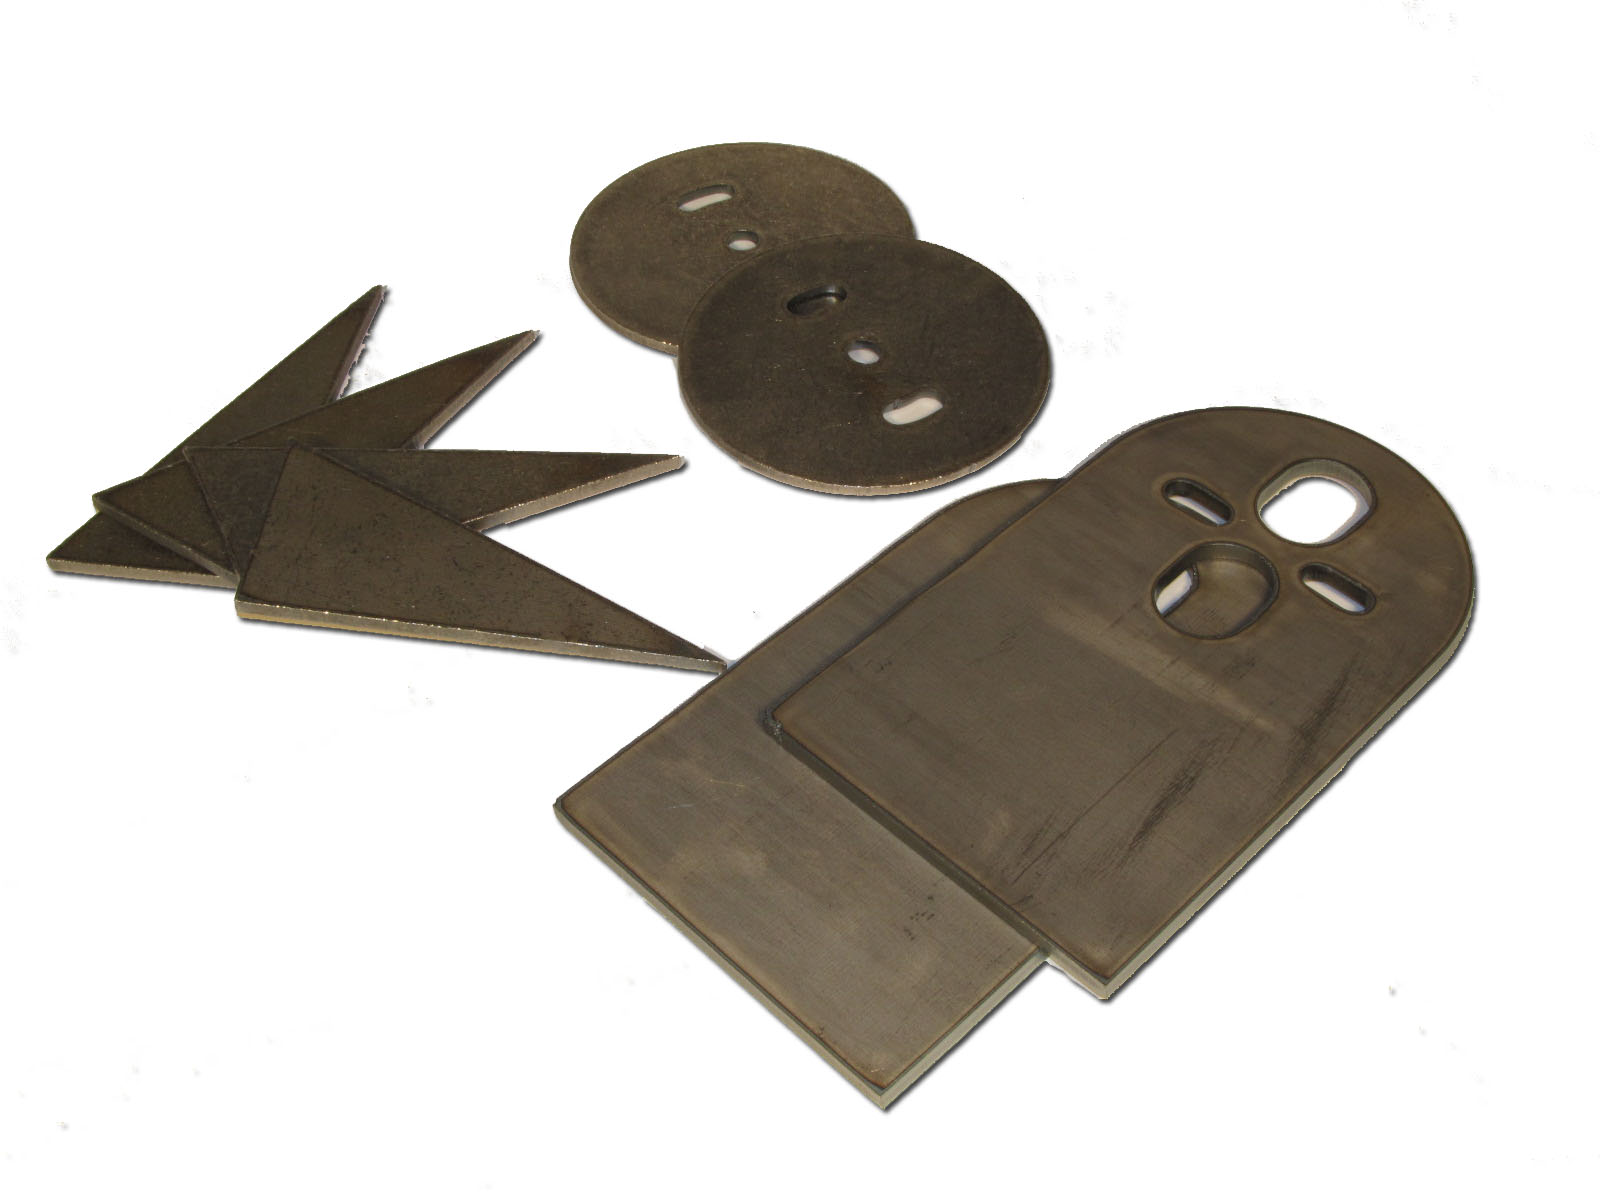 minitruck, mini truck, torsion bar, brackets, air bag brackets, eliminate torsion bar